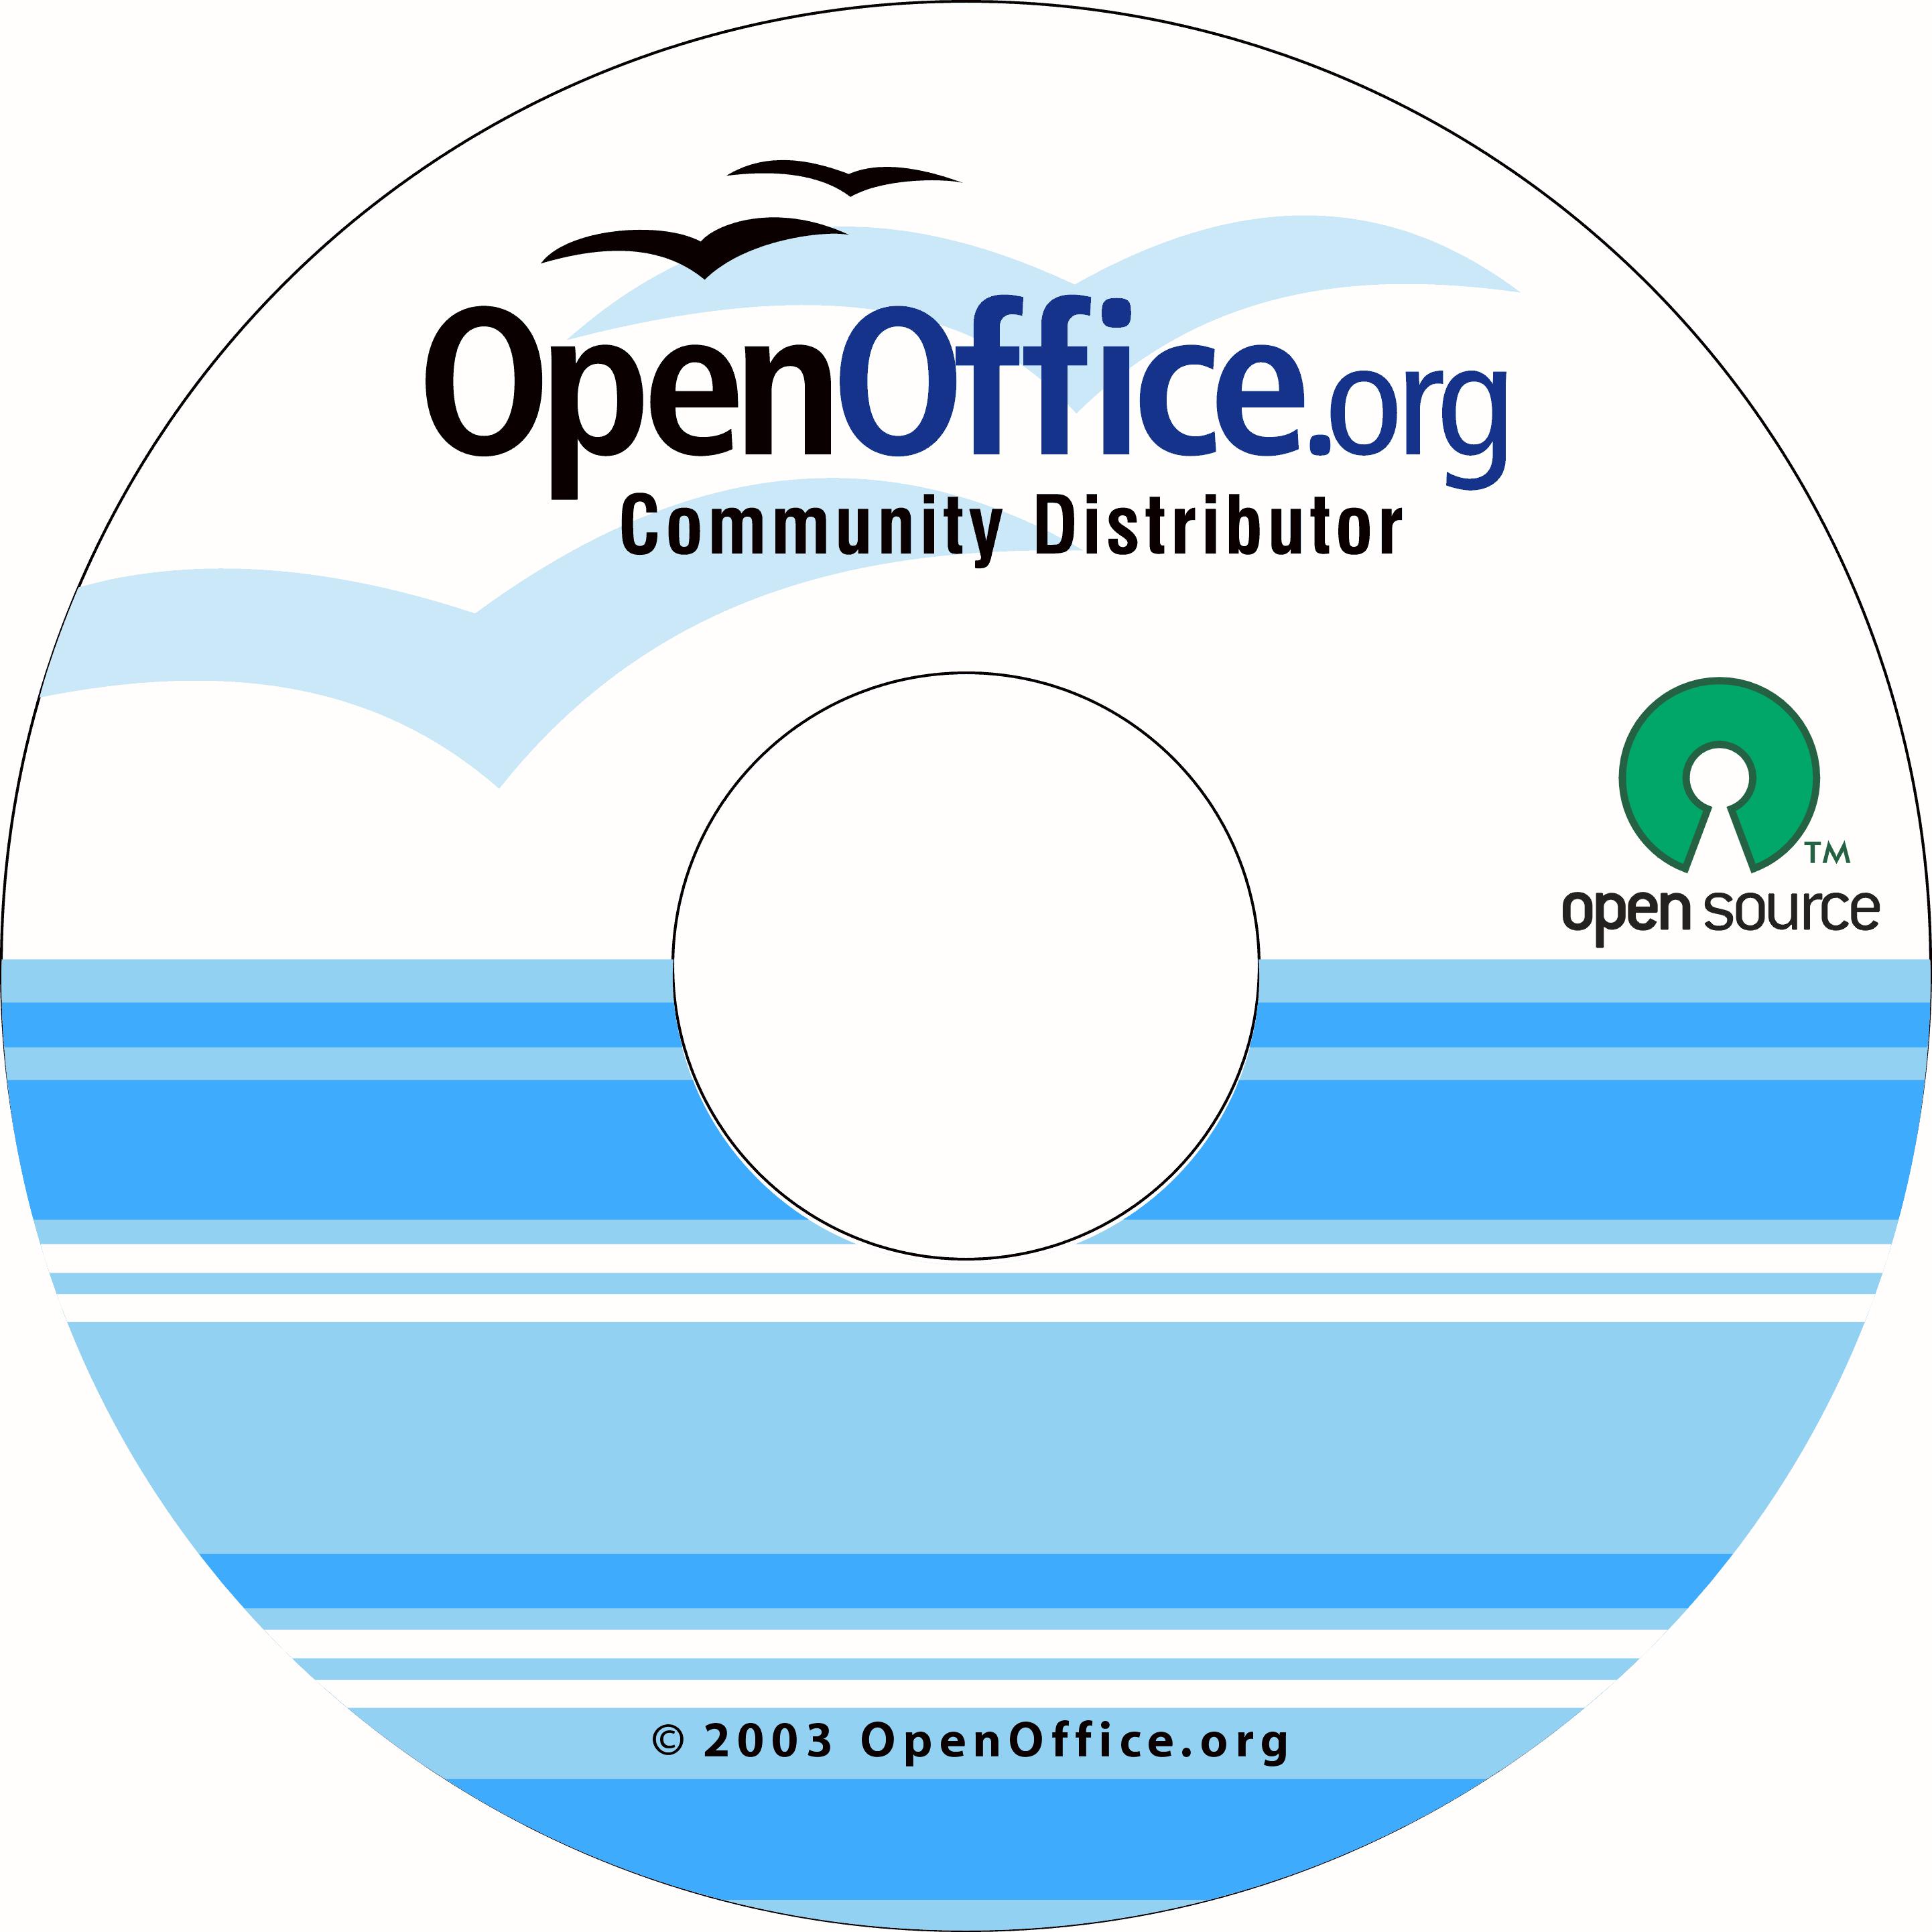 OpenOffice.org CD Art - previous versions